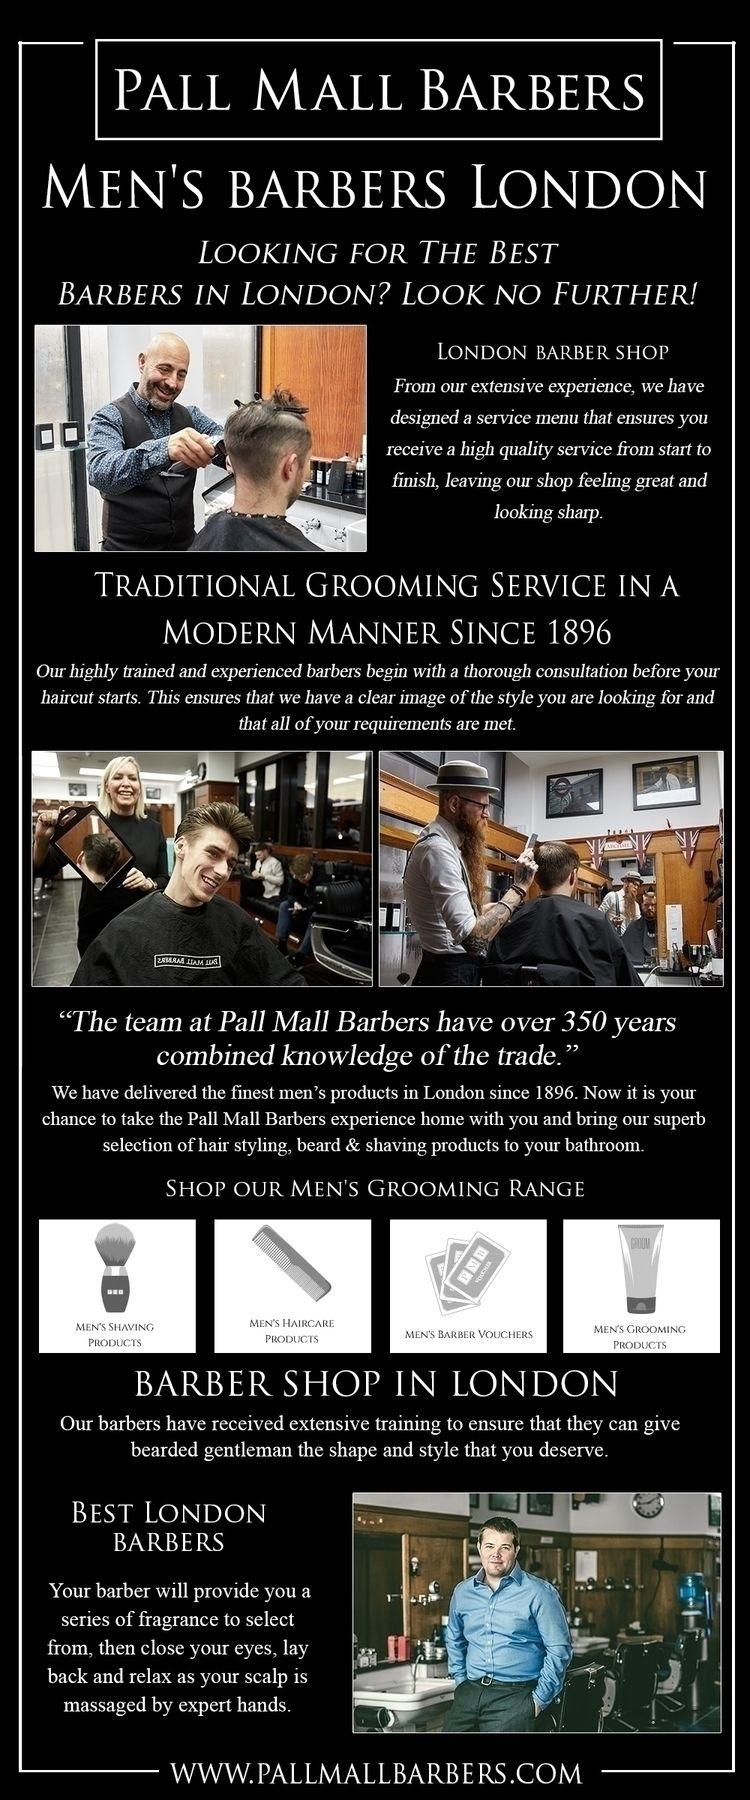 barbers London services master  - barbersinlondon | ello